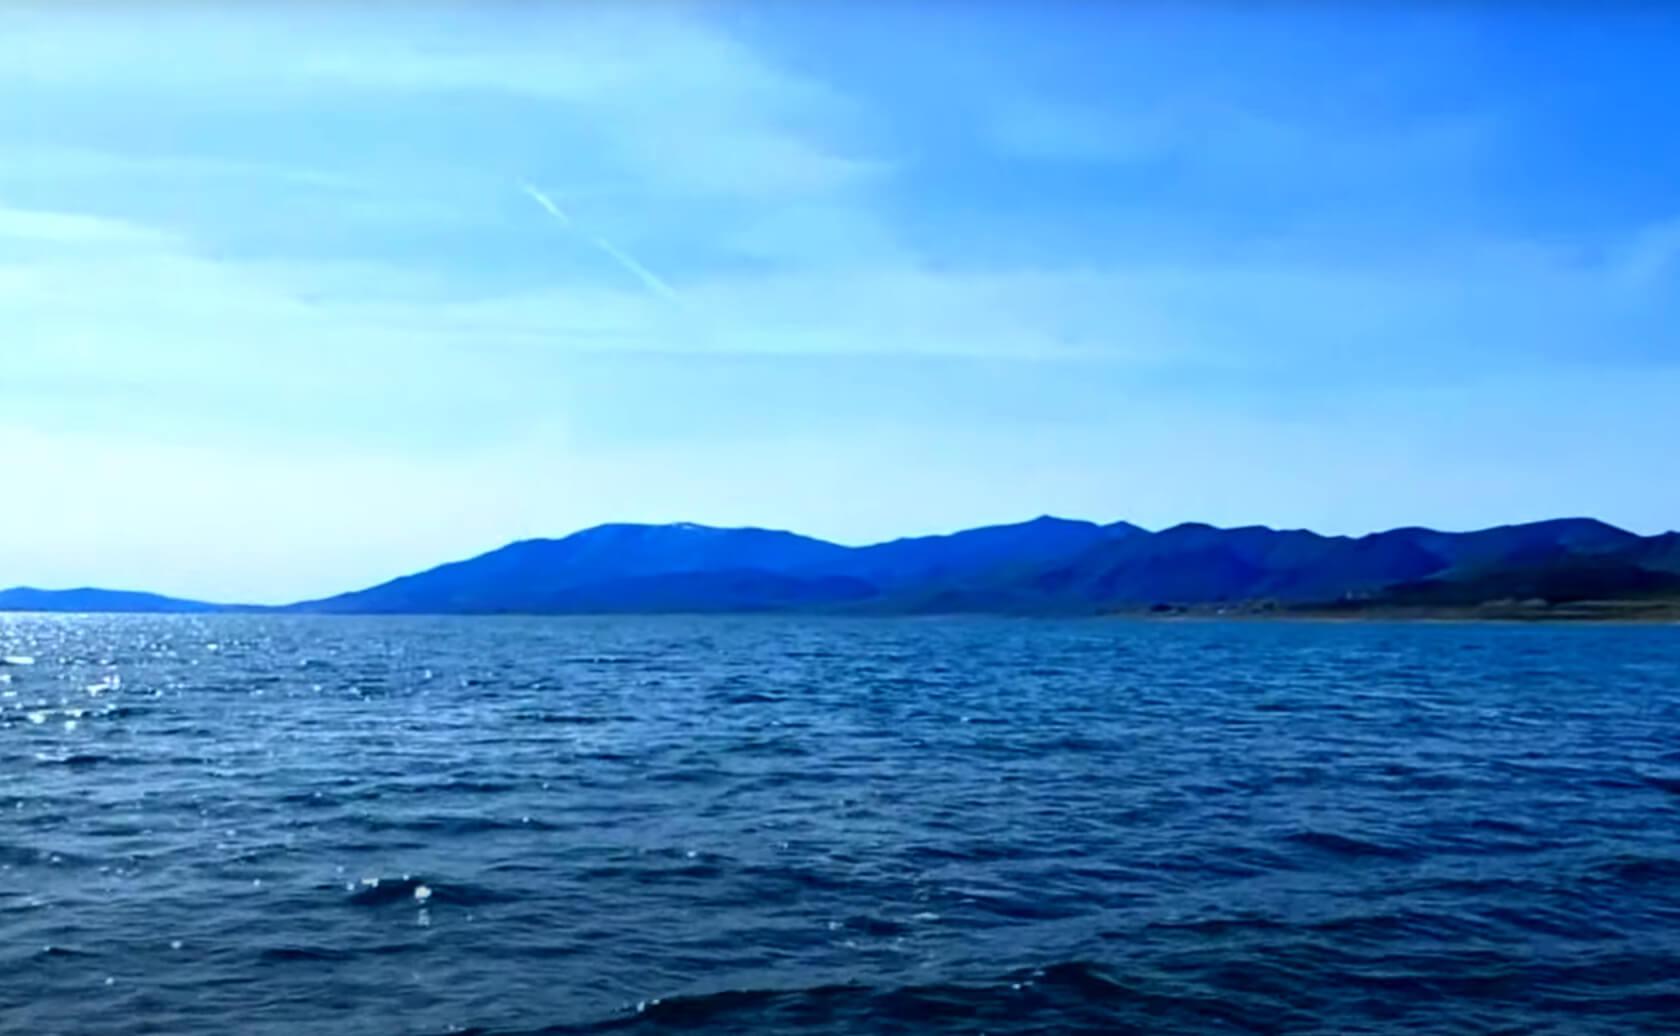 pyramid-lake-fishing-guide-nv-01